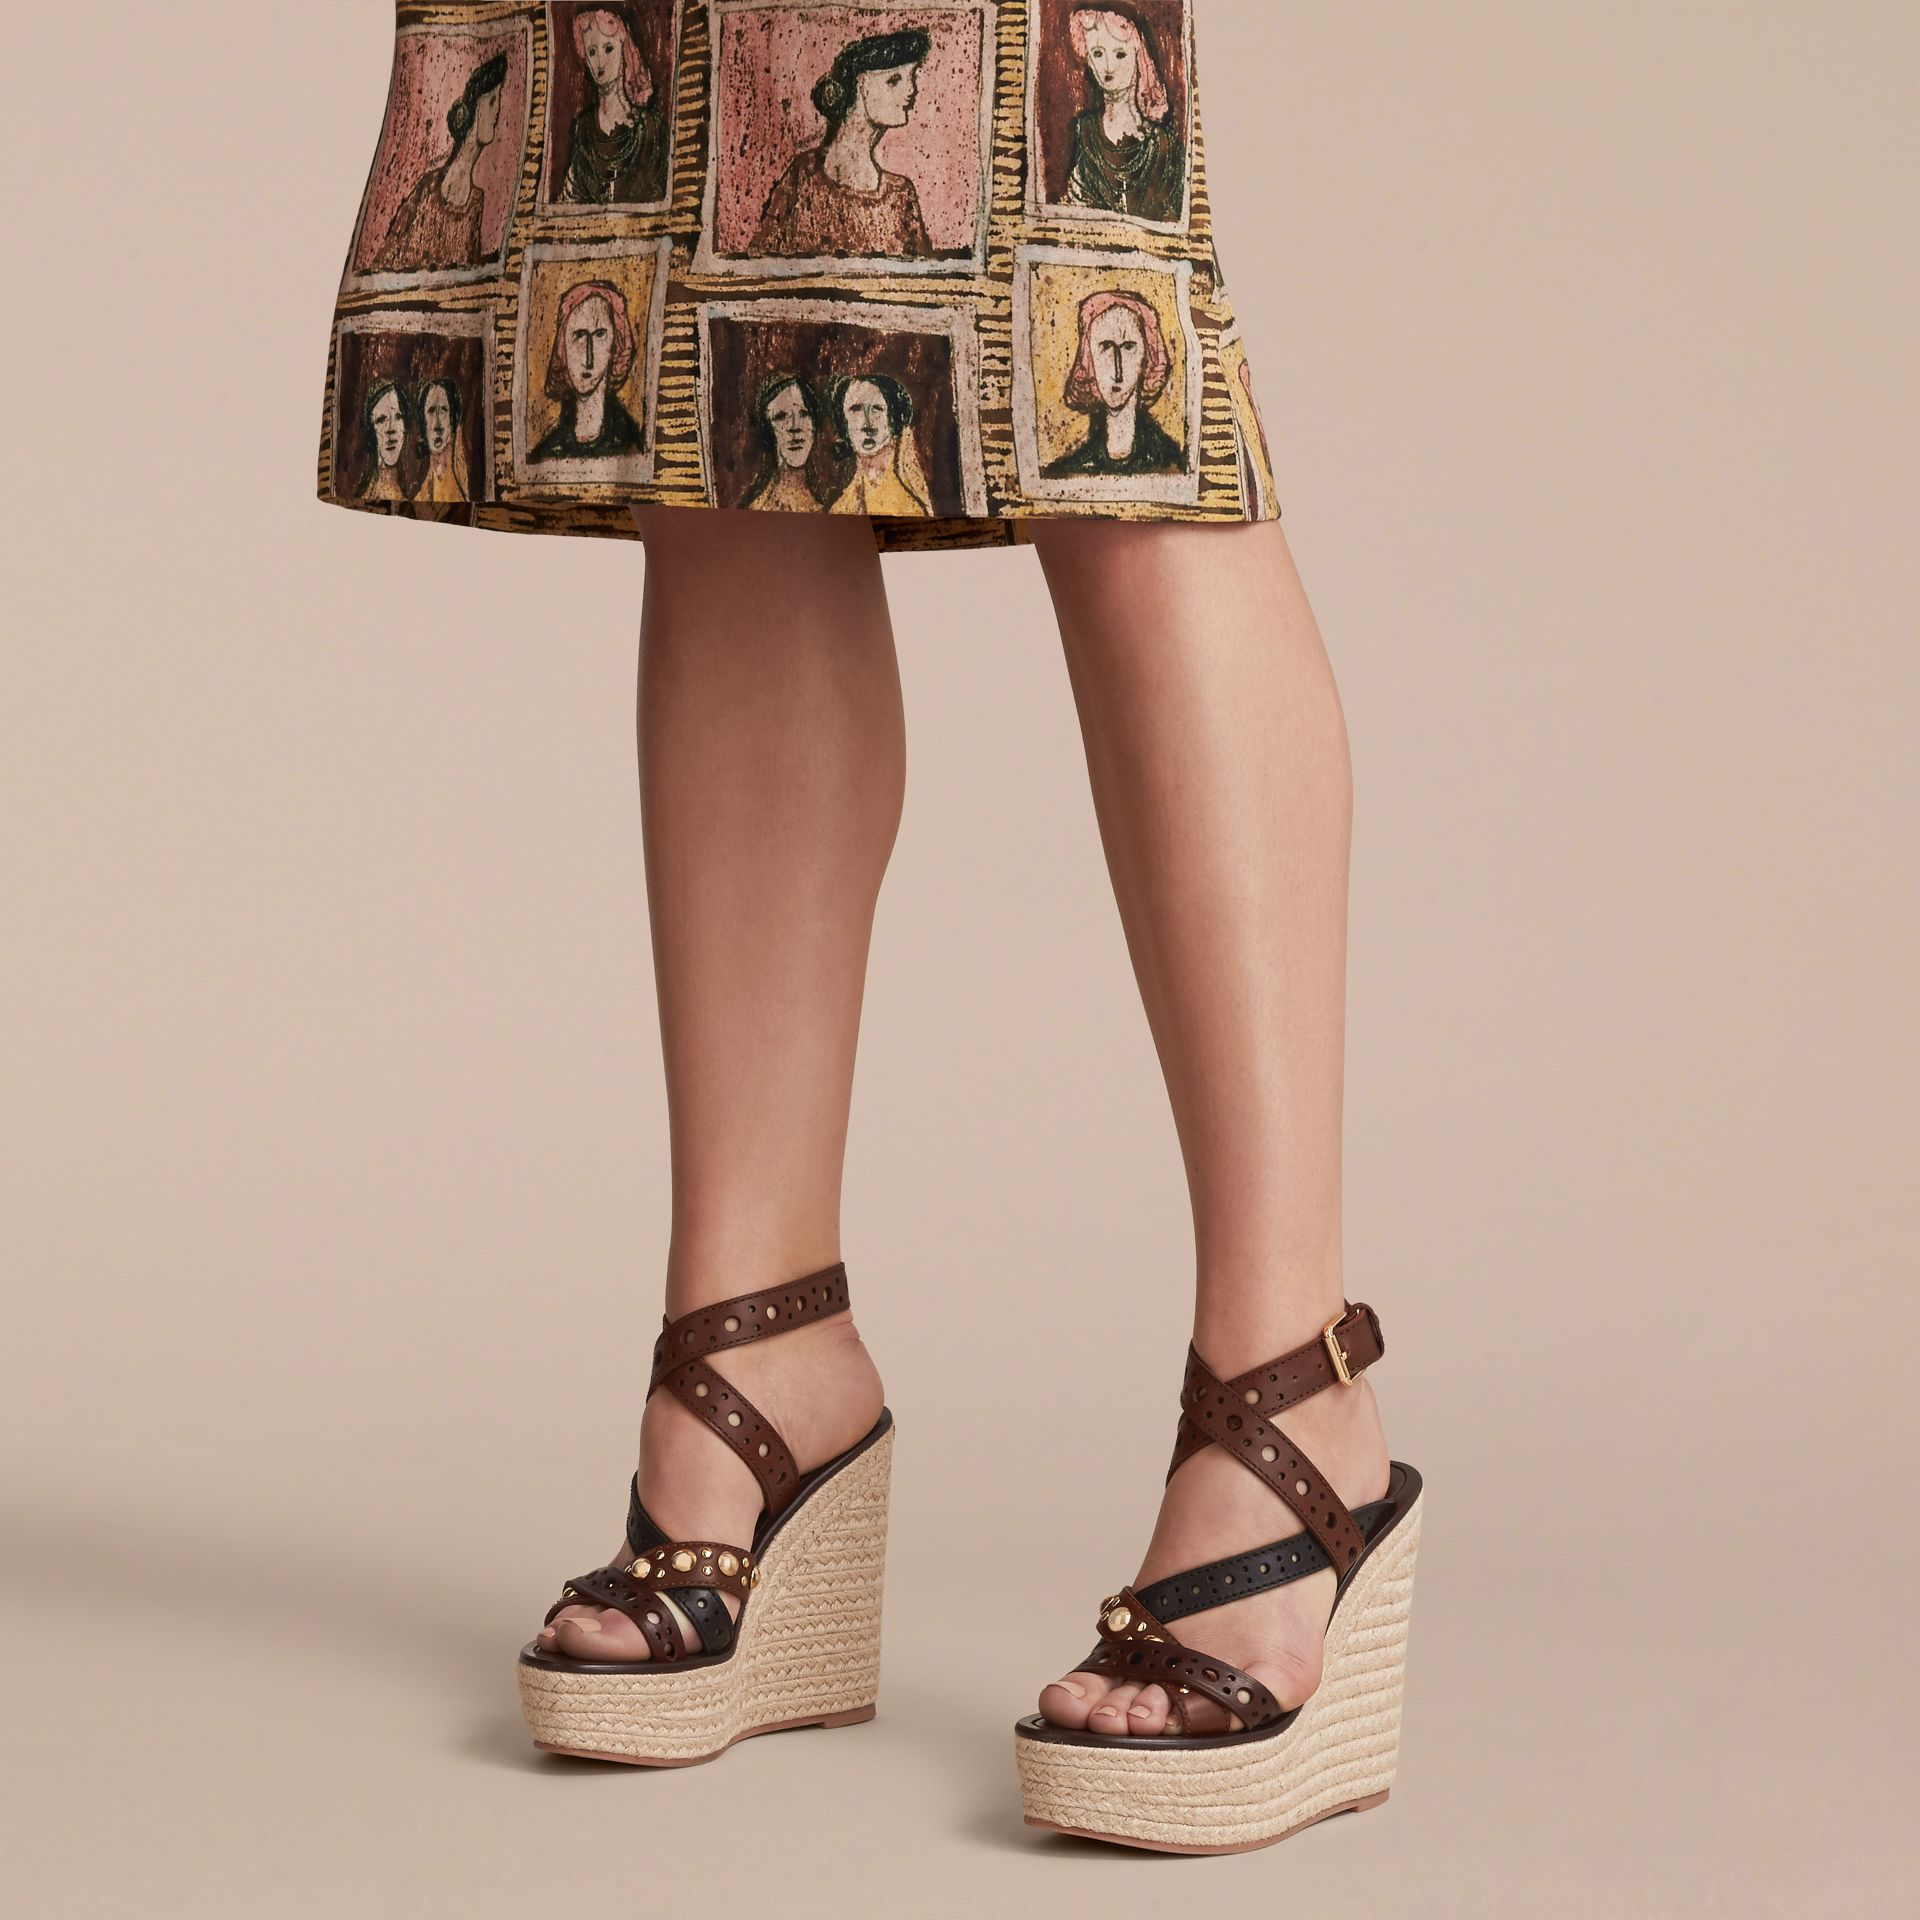 Riveted Leather Platform Espadrille Wedge Sandals - gallery image 3